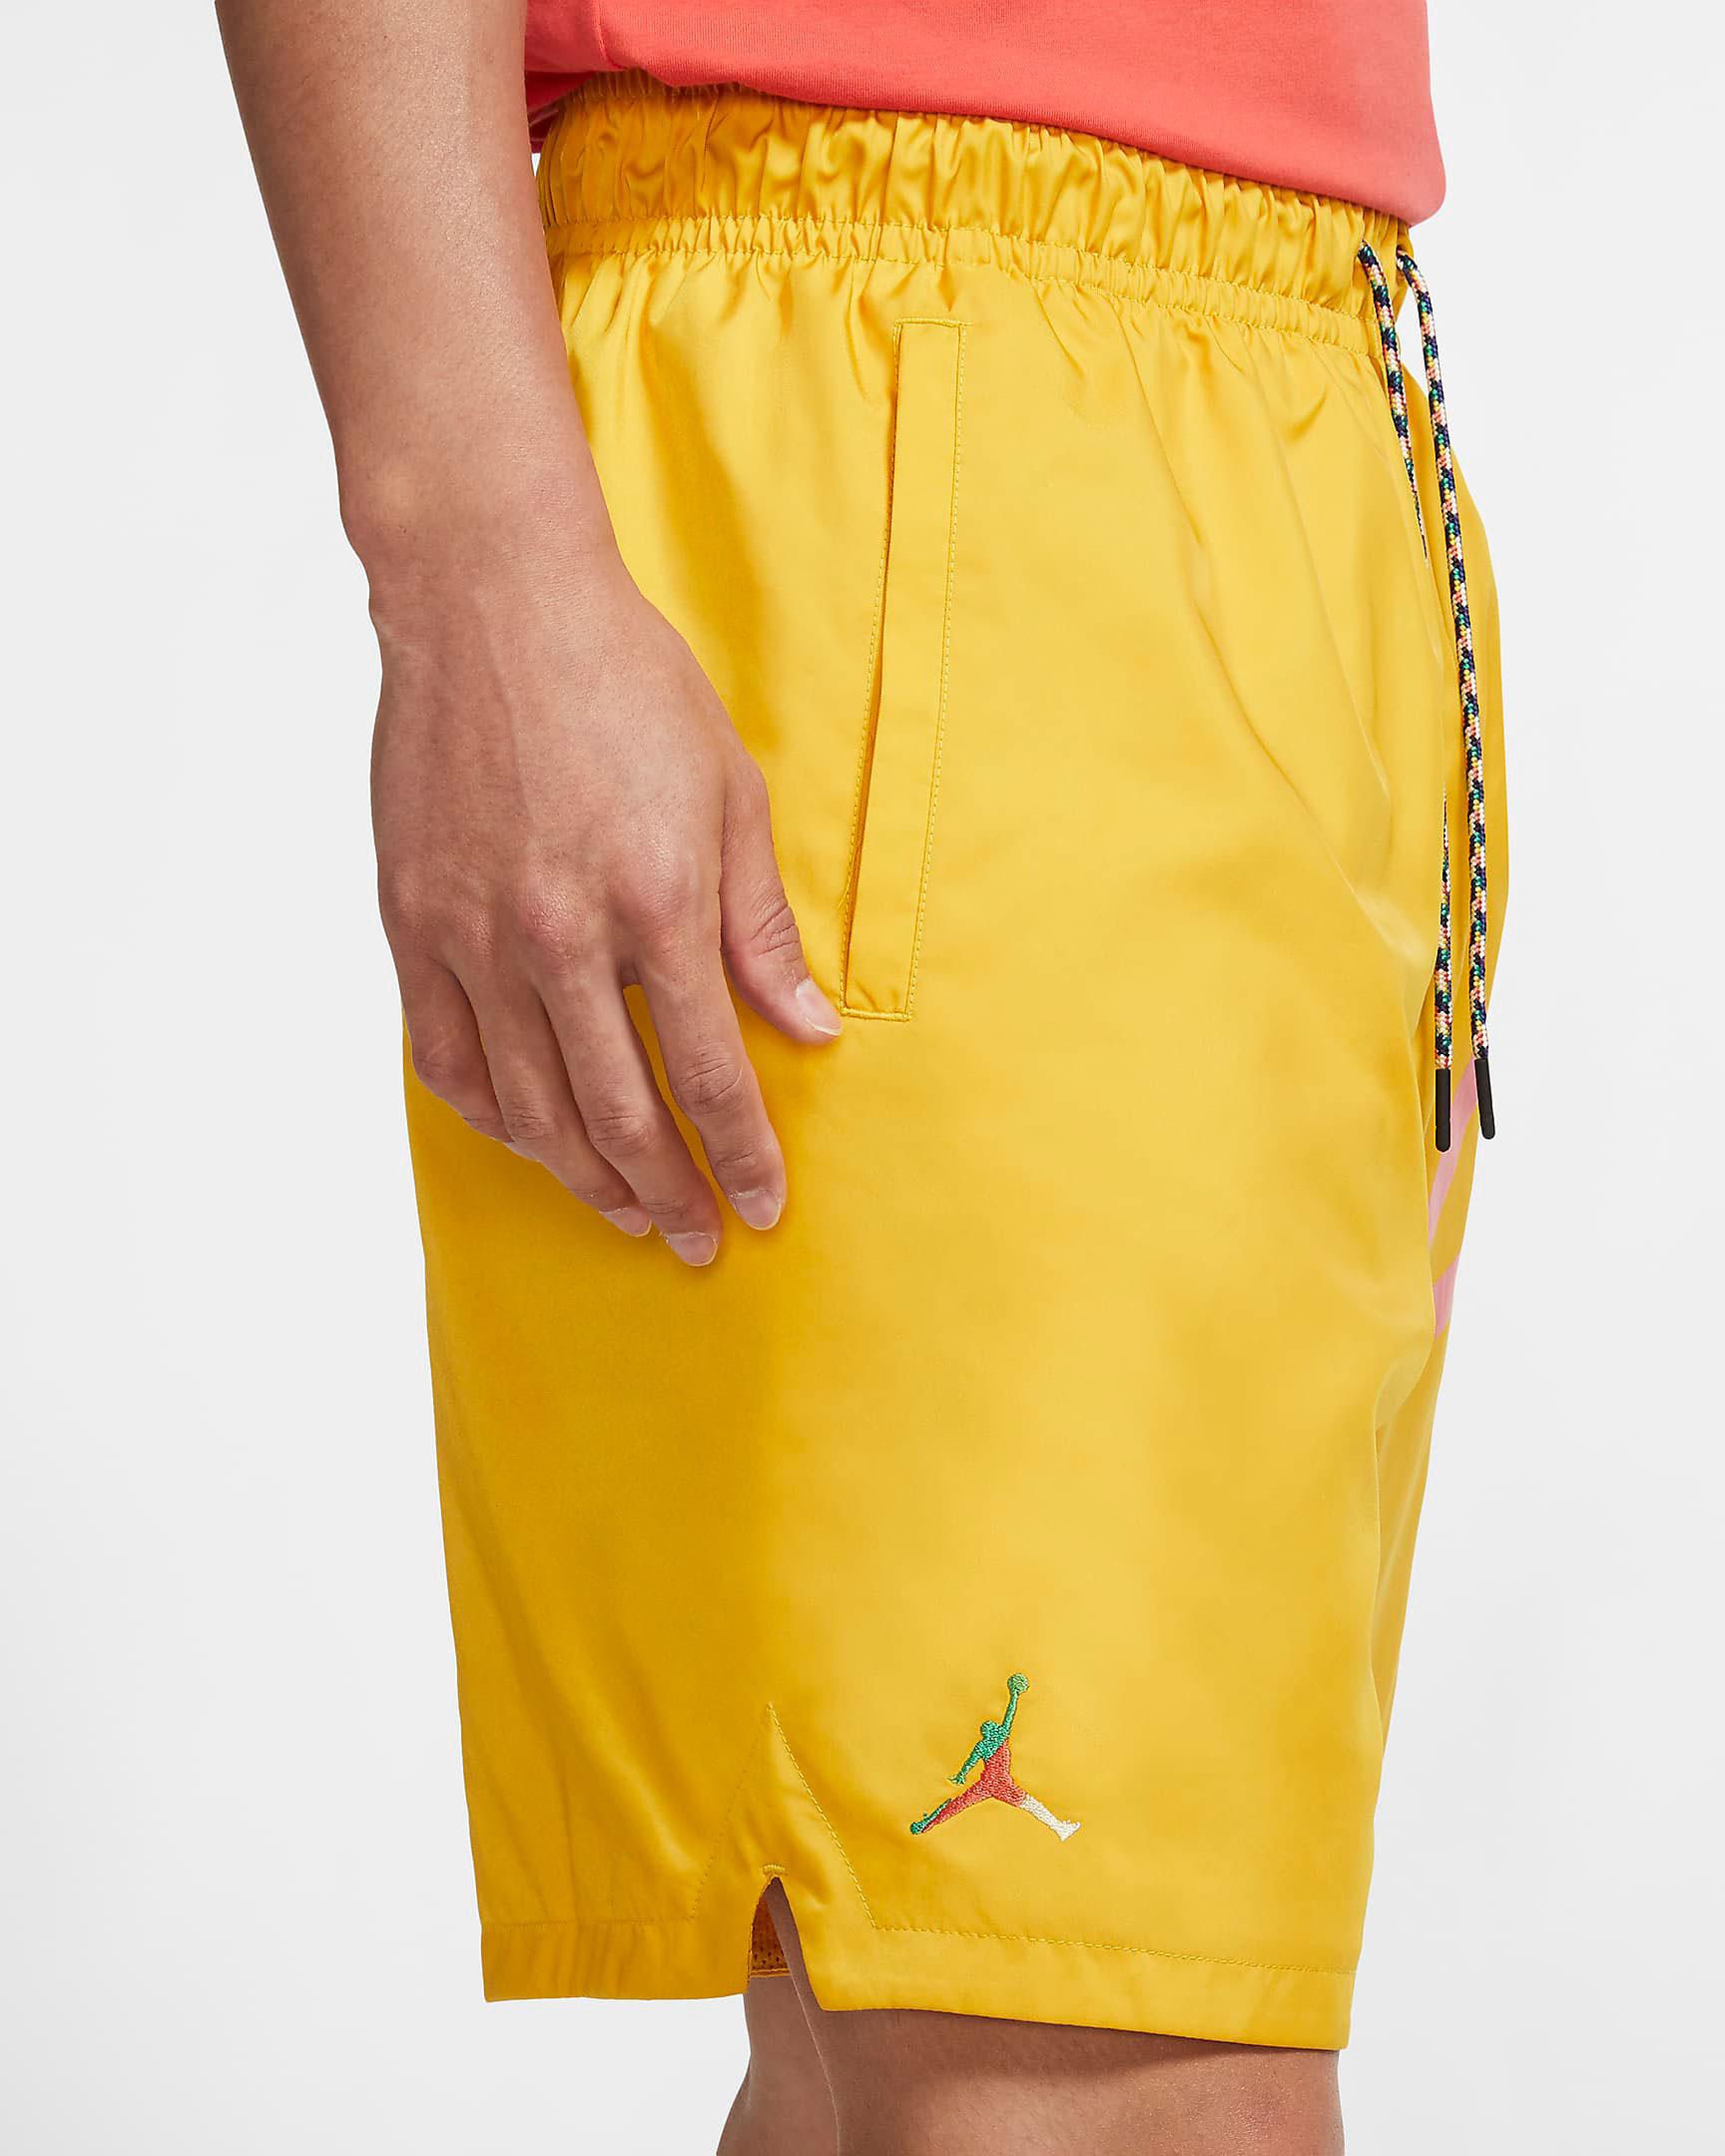 air-jordan-12-university-gold-matching-shorts-3